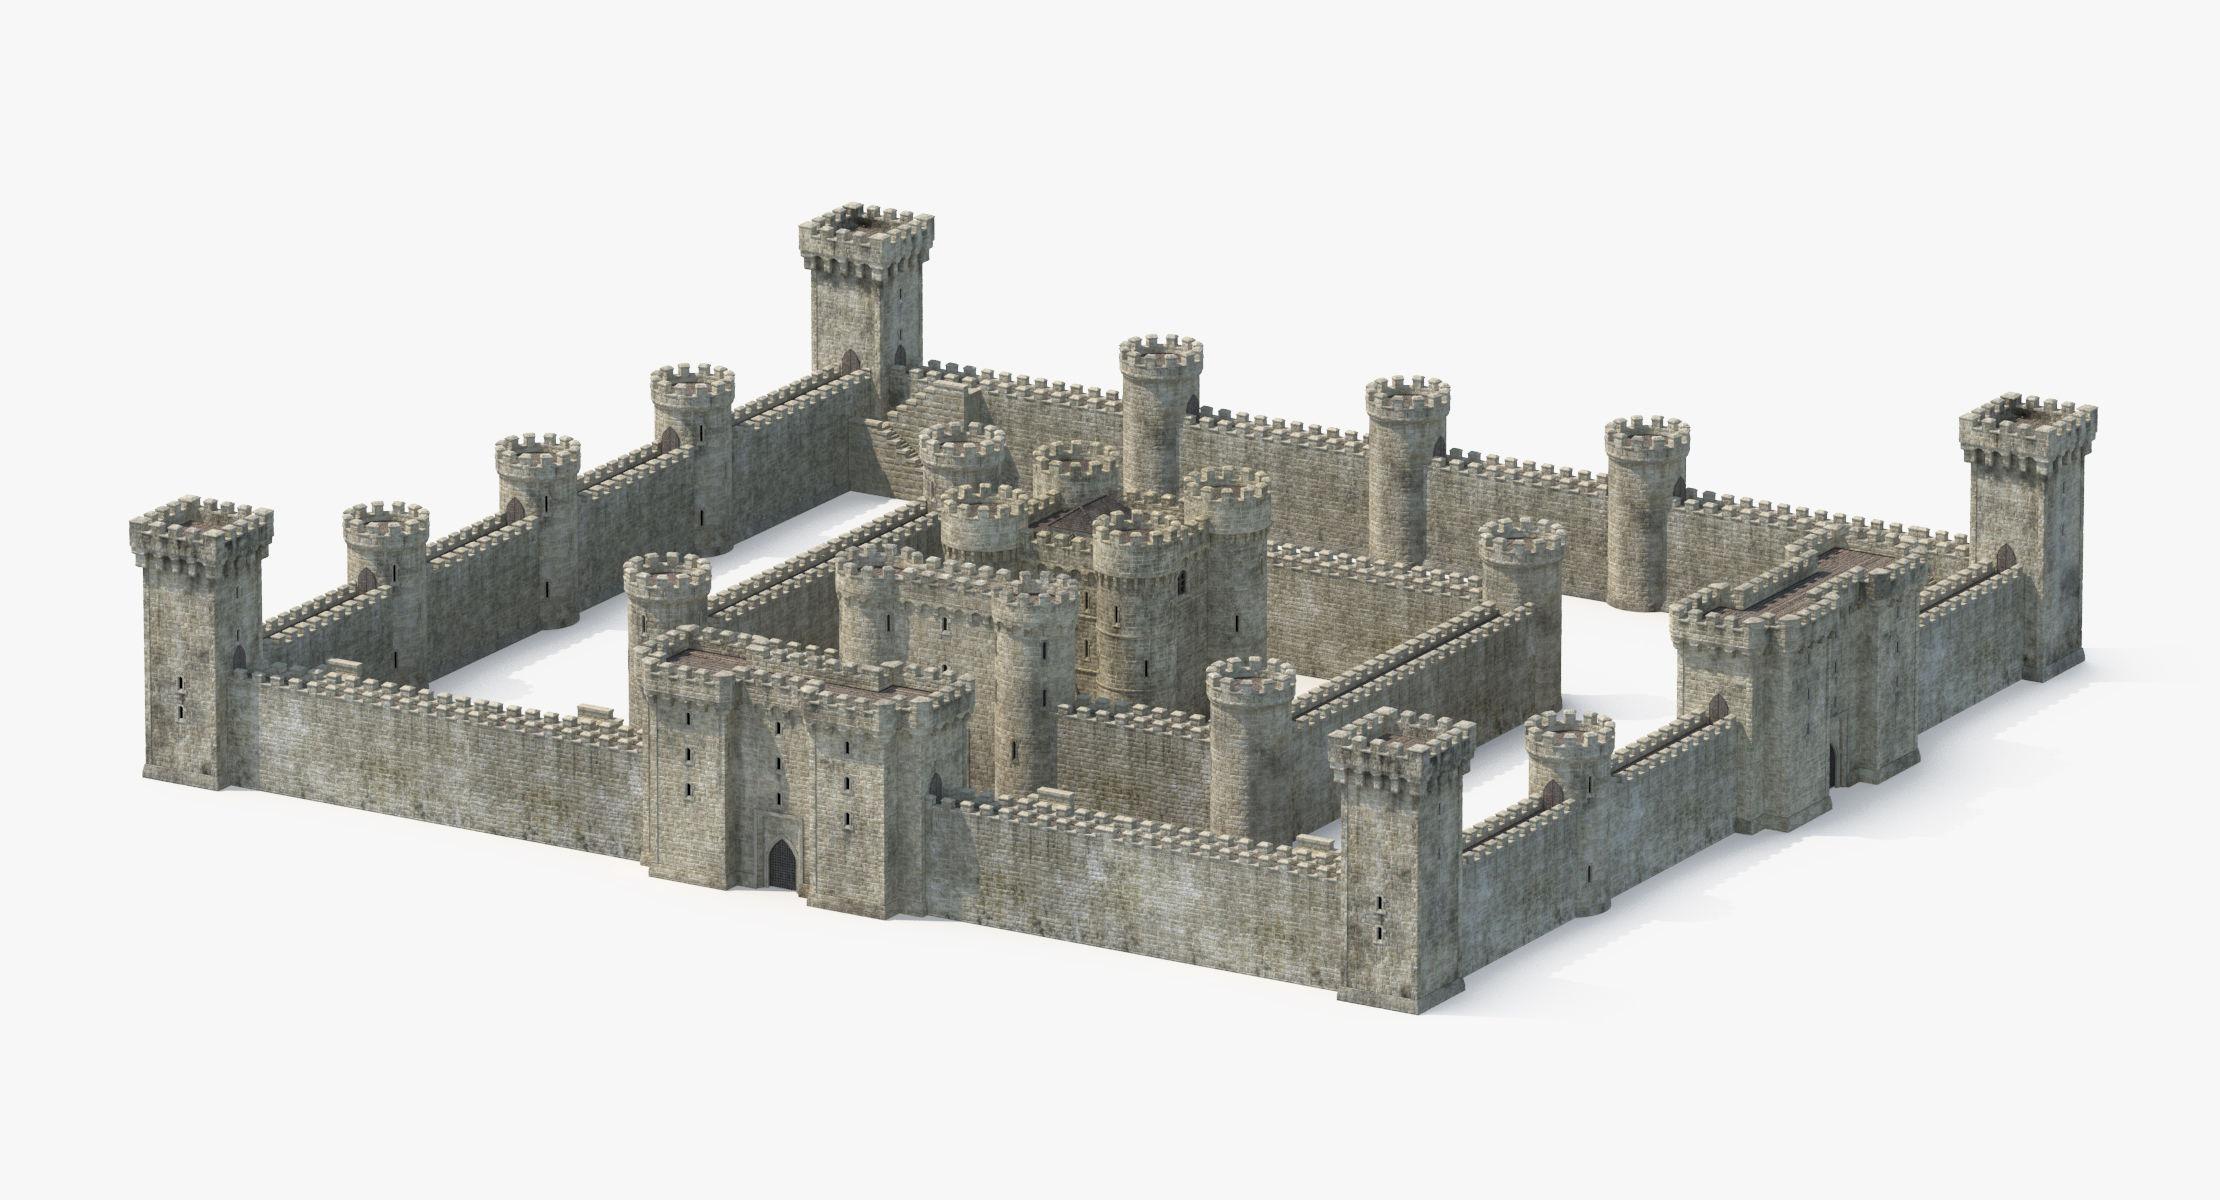 Castle Generic - reel 1